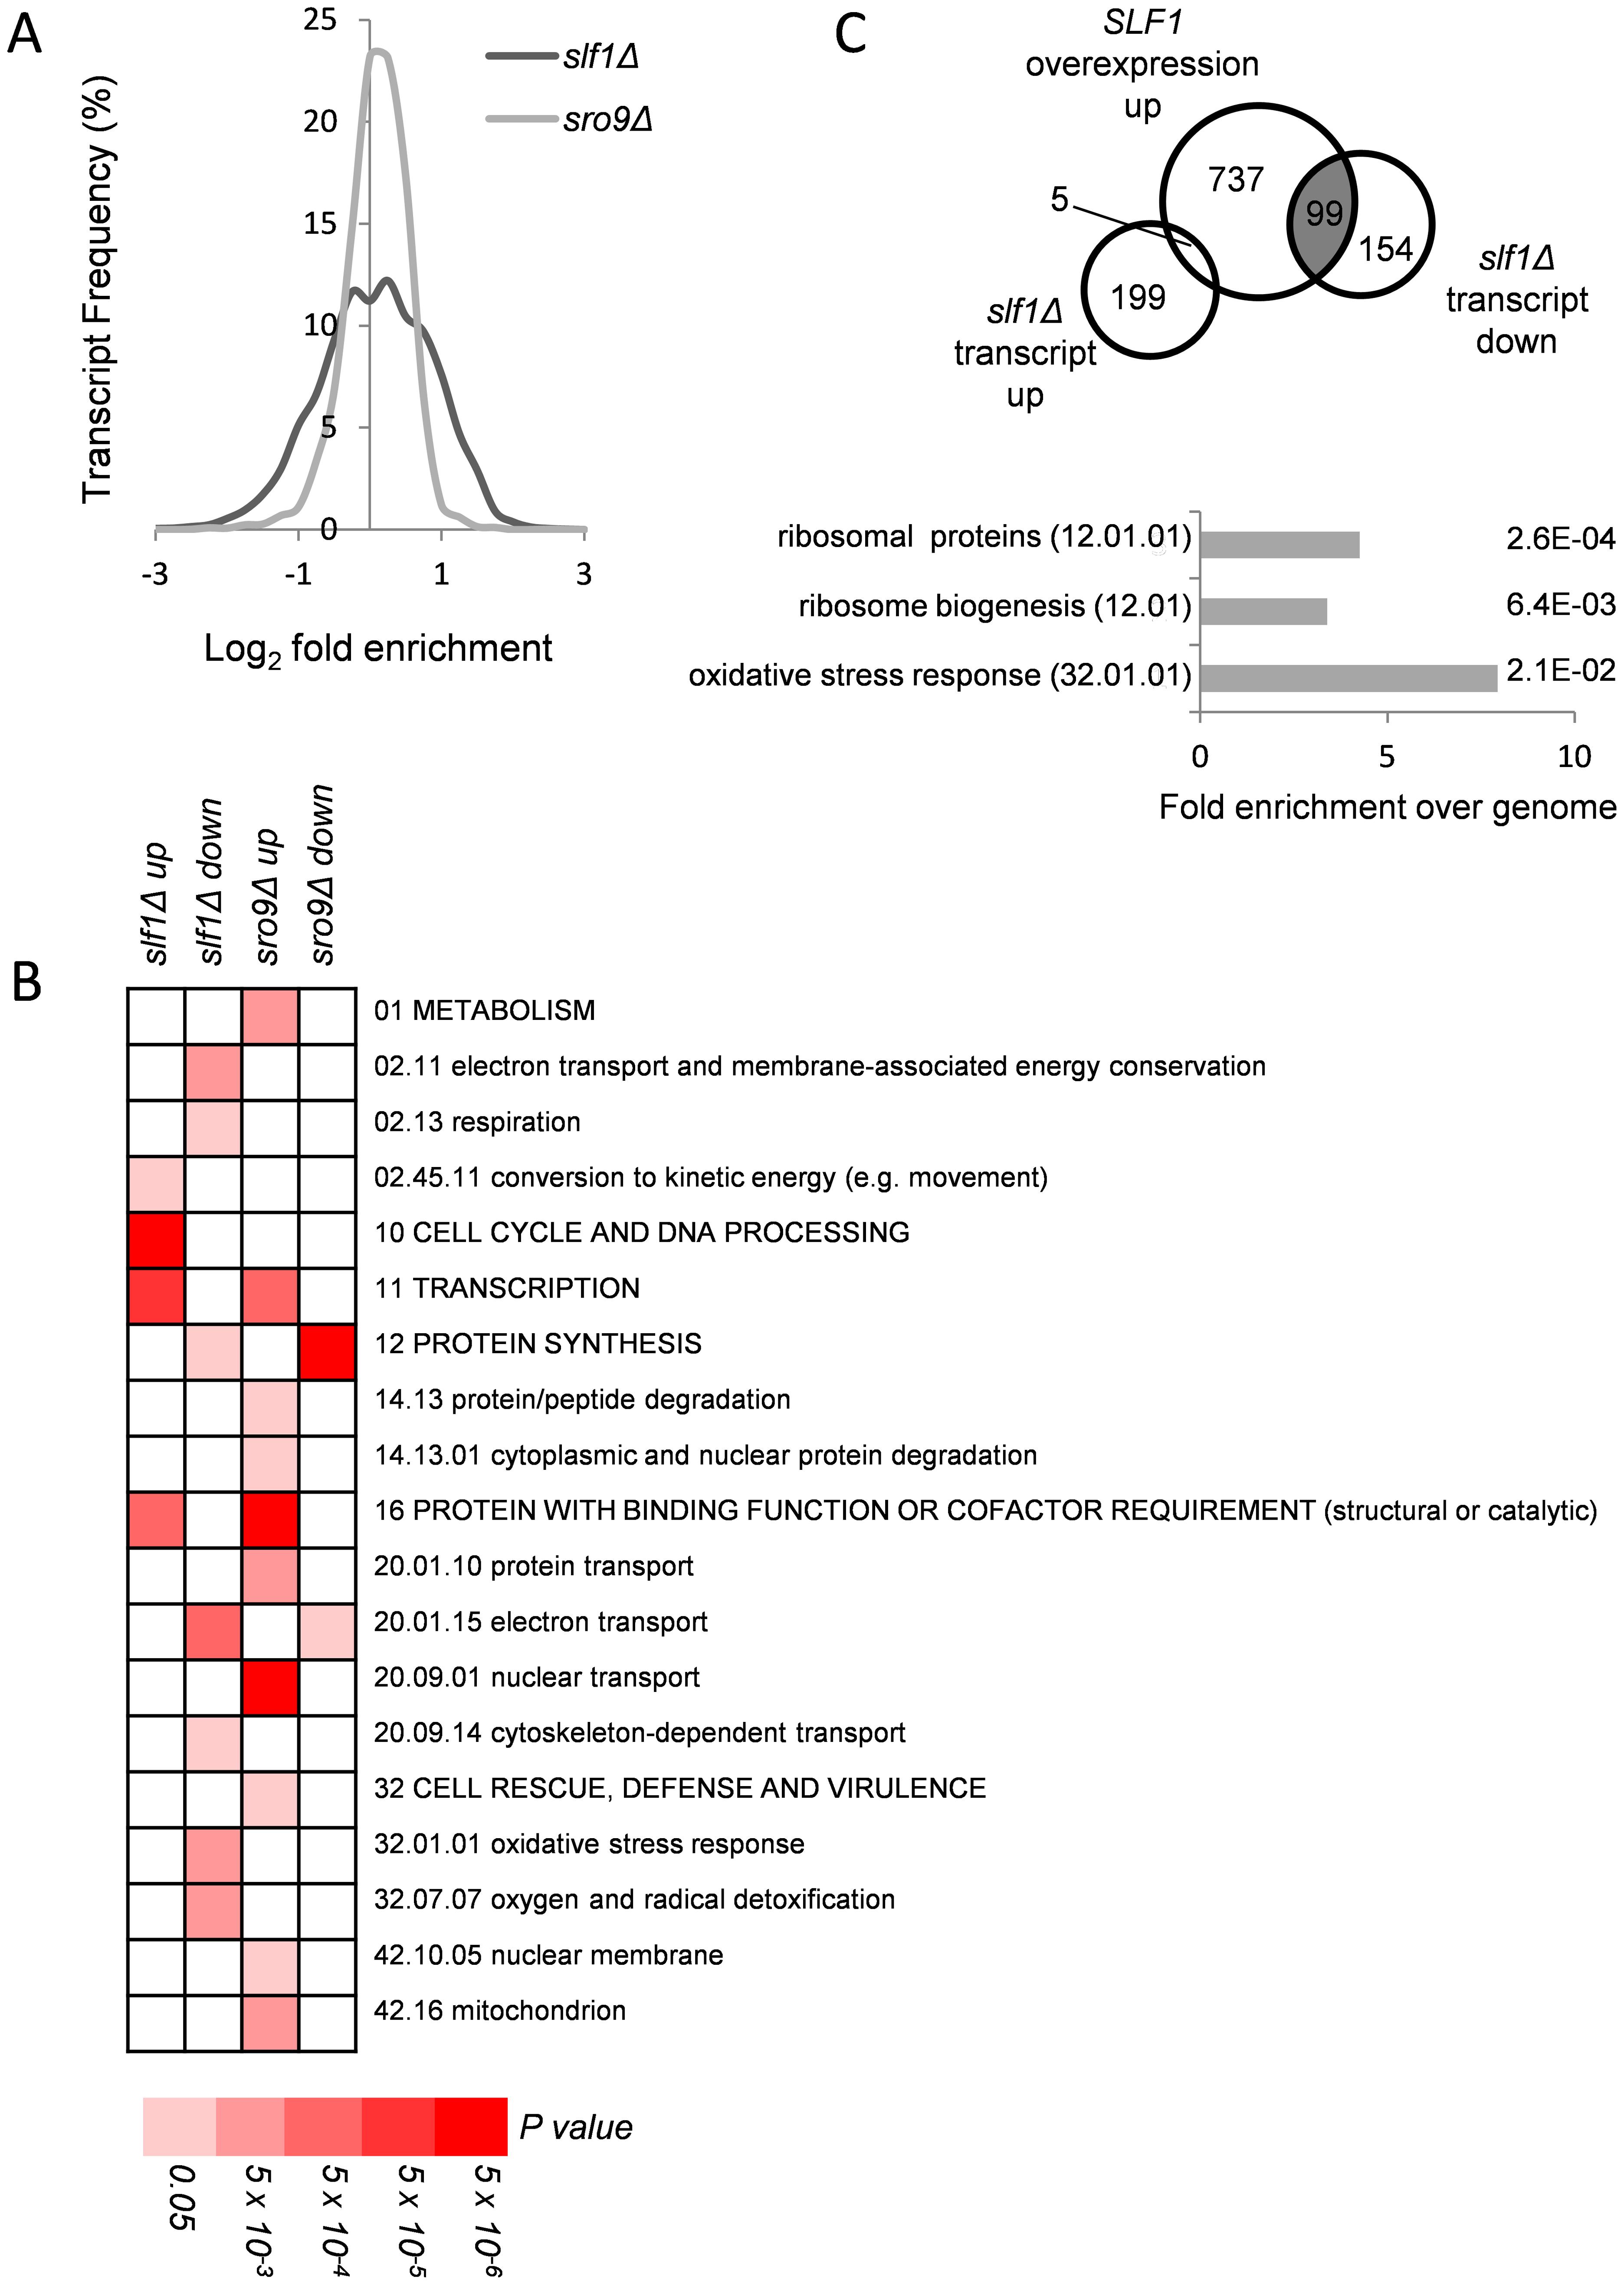 Alterations in mRNA abundance in <i>slf1</i> and <i>sro9</i> deletion mutants.